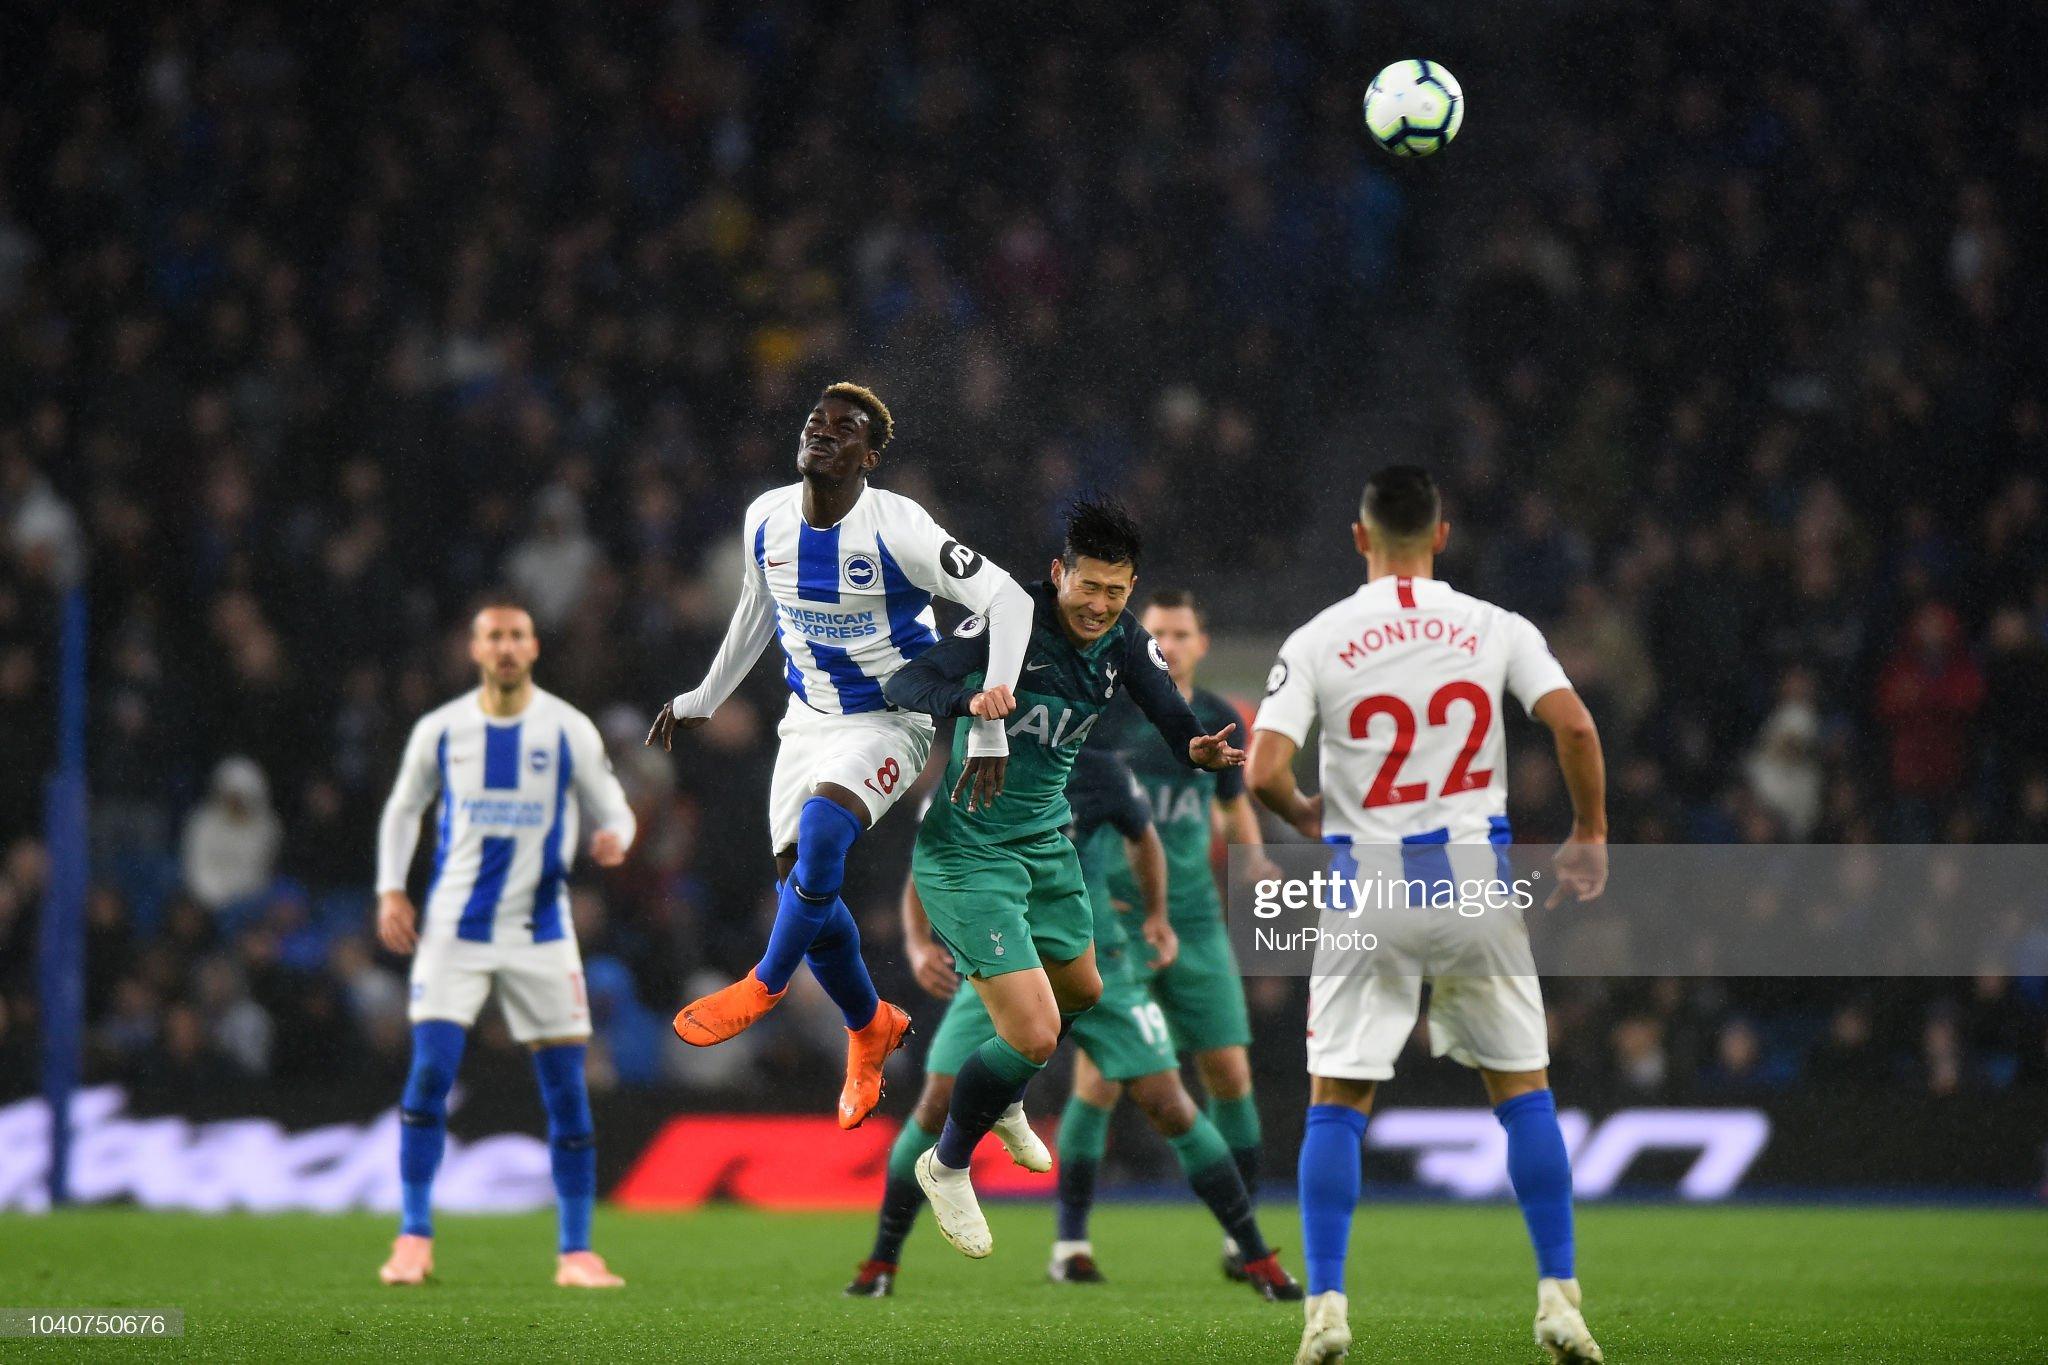 Brighton v Tottenham preview, prediction and odds